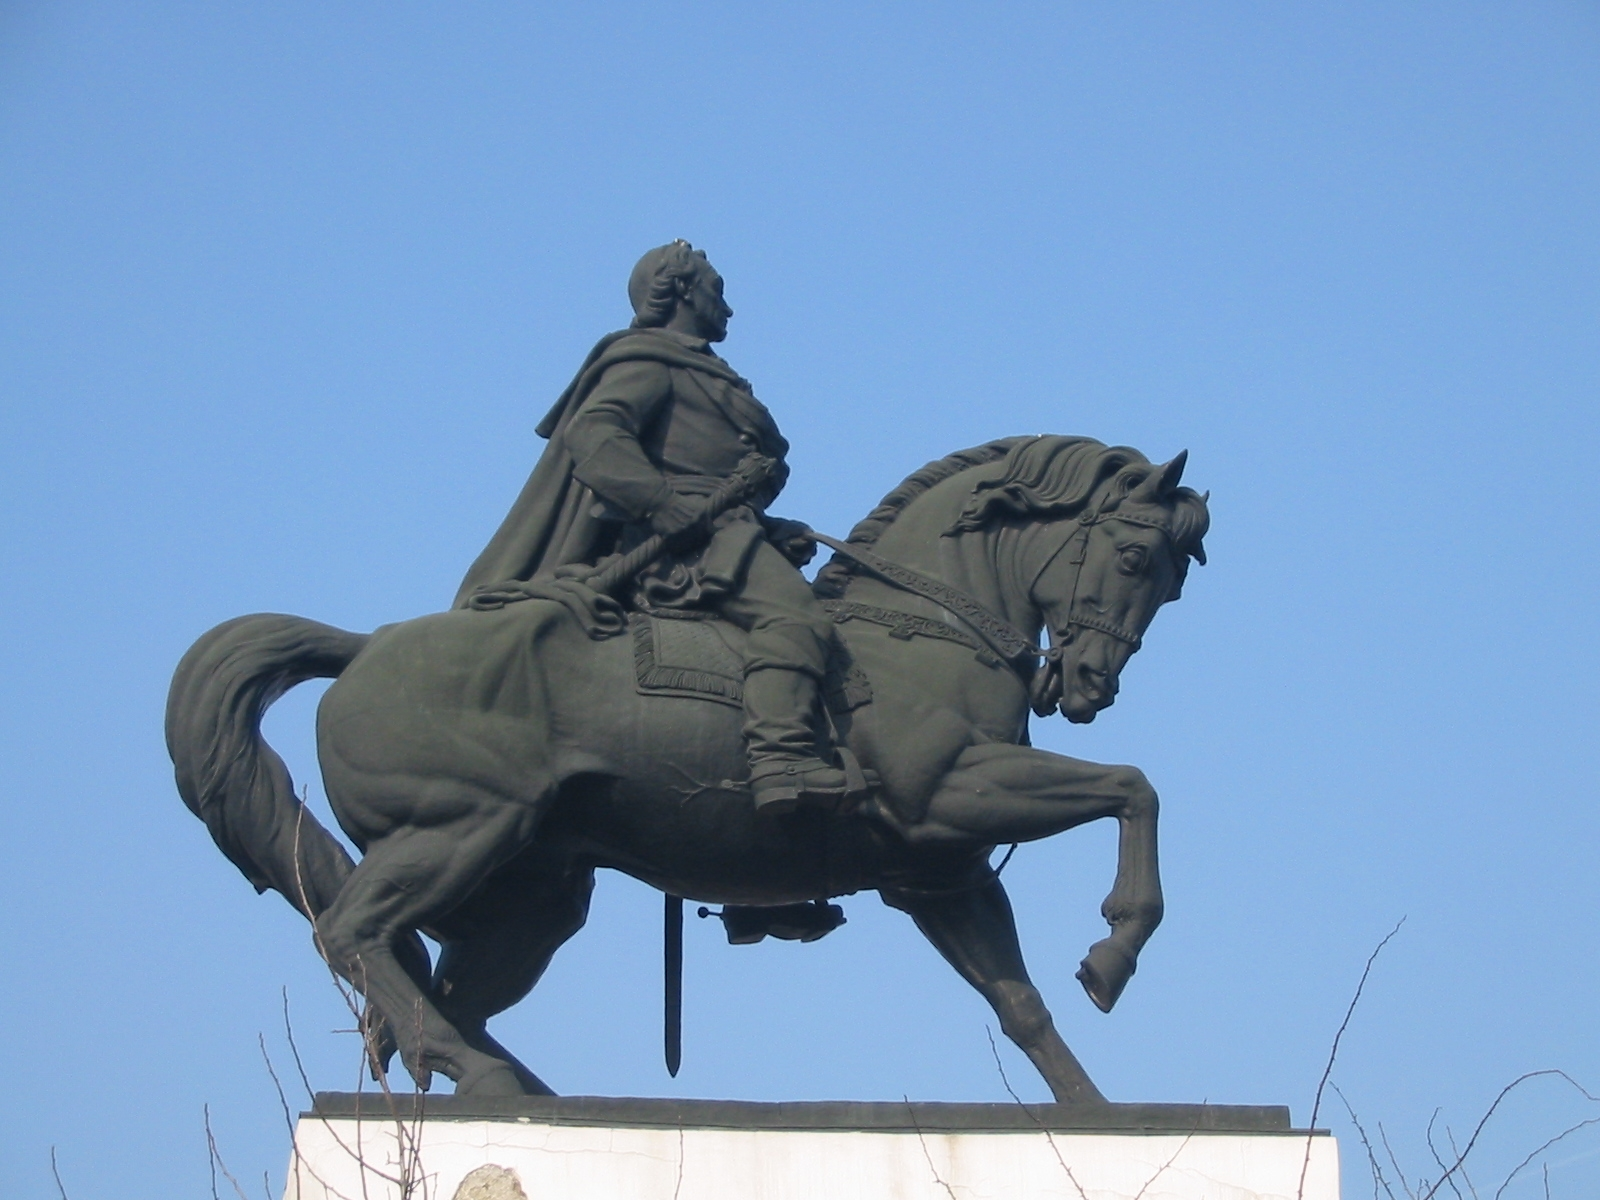 Fişier:Suvorov guarding the ramna river 1.jpg